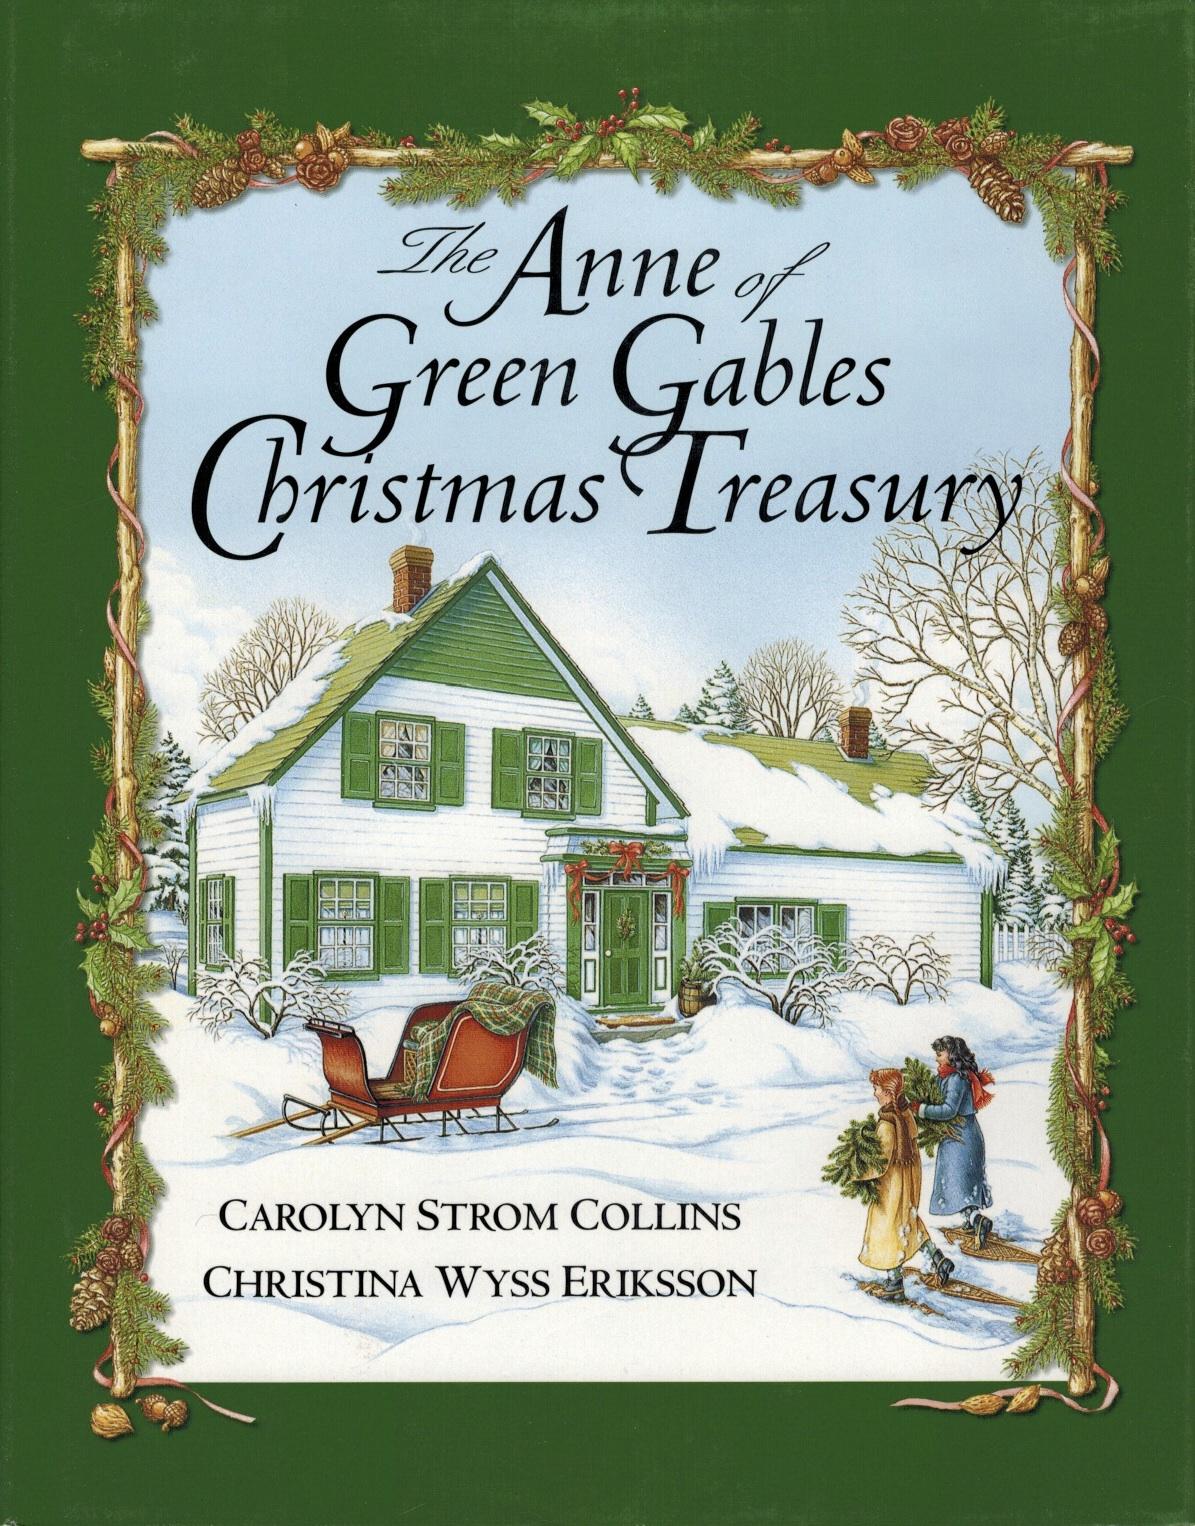 the-anne-of-green-gables-christmas-treasury.jpg